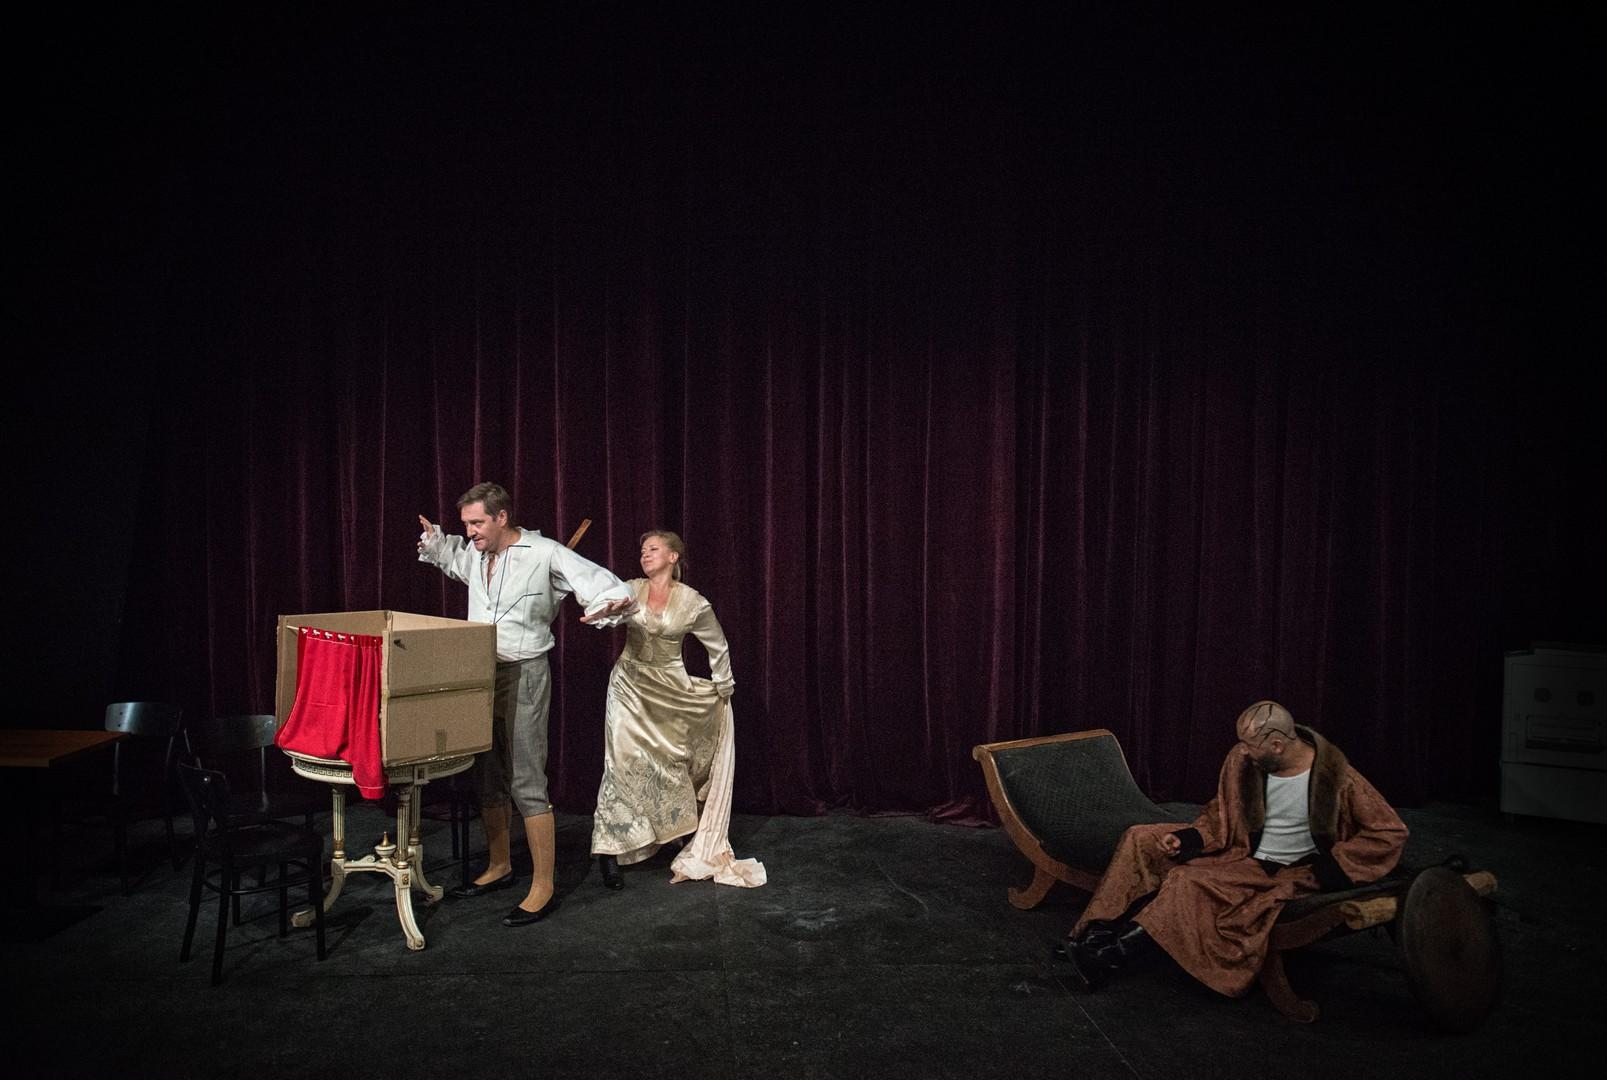 """Nie-boska komedia"", fot. Magda Hueckel (źródło: materiały prasowe organizatora)"